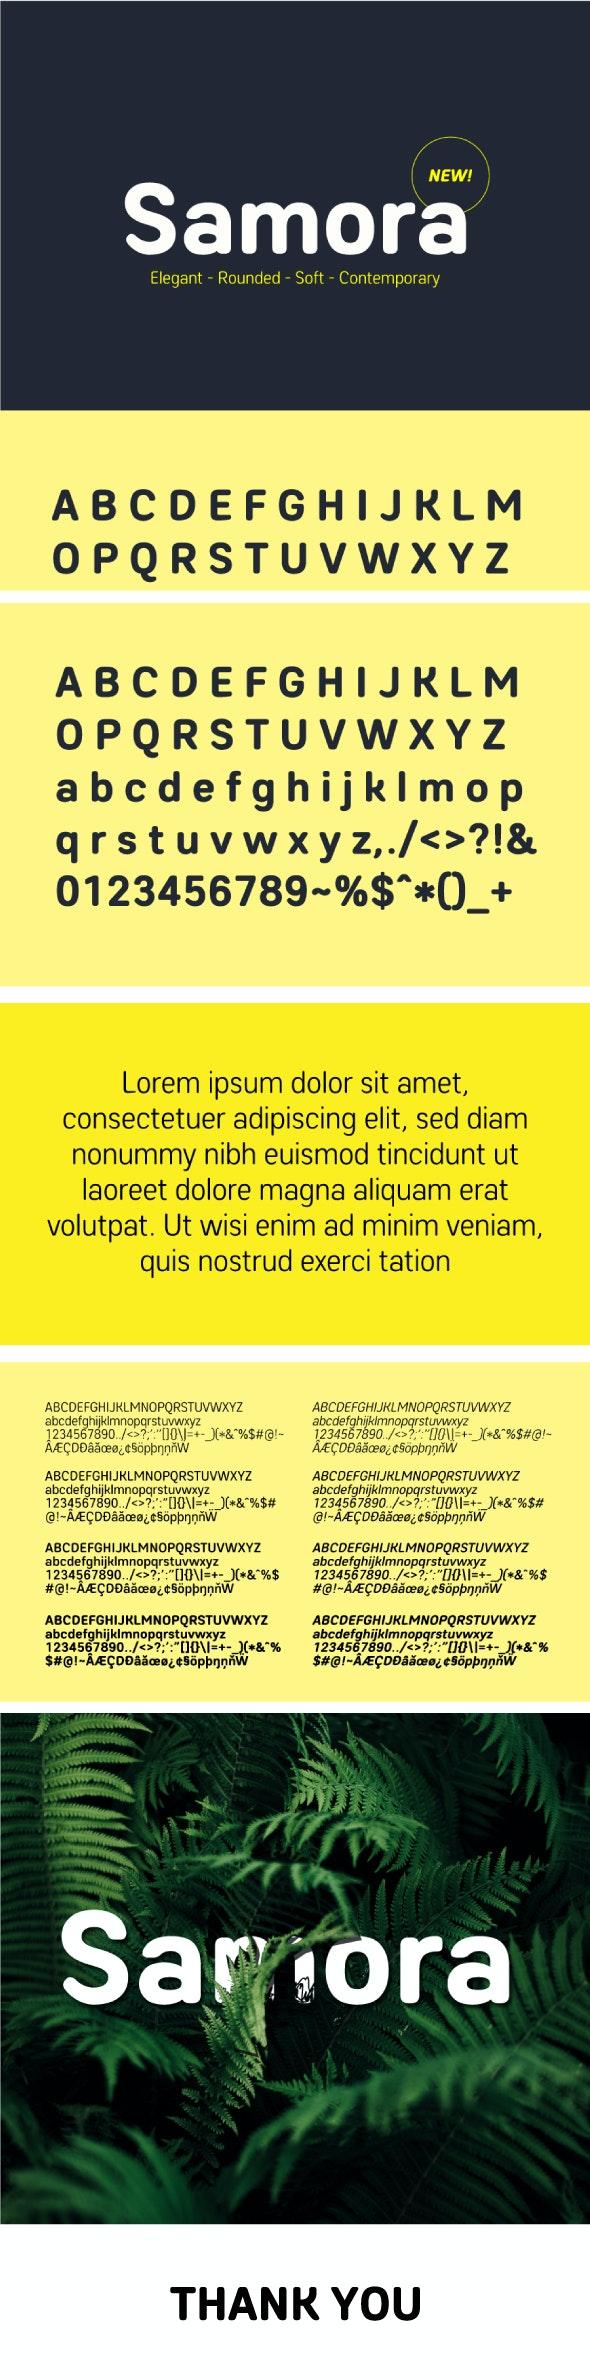 Samora Rounded Font - Miscellaneous Sans-Serif